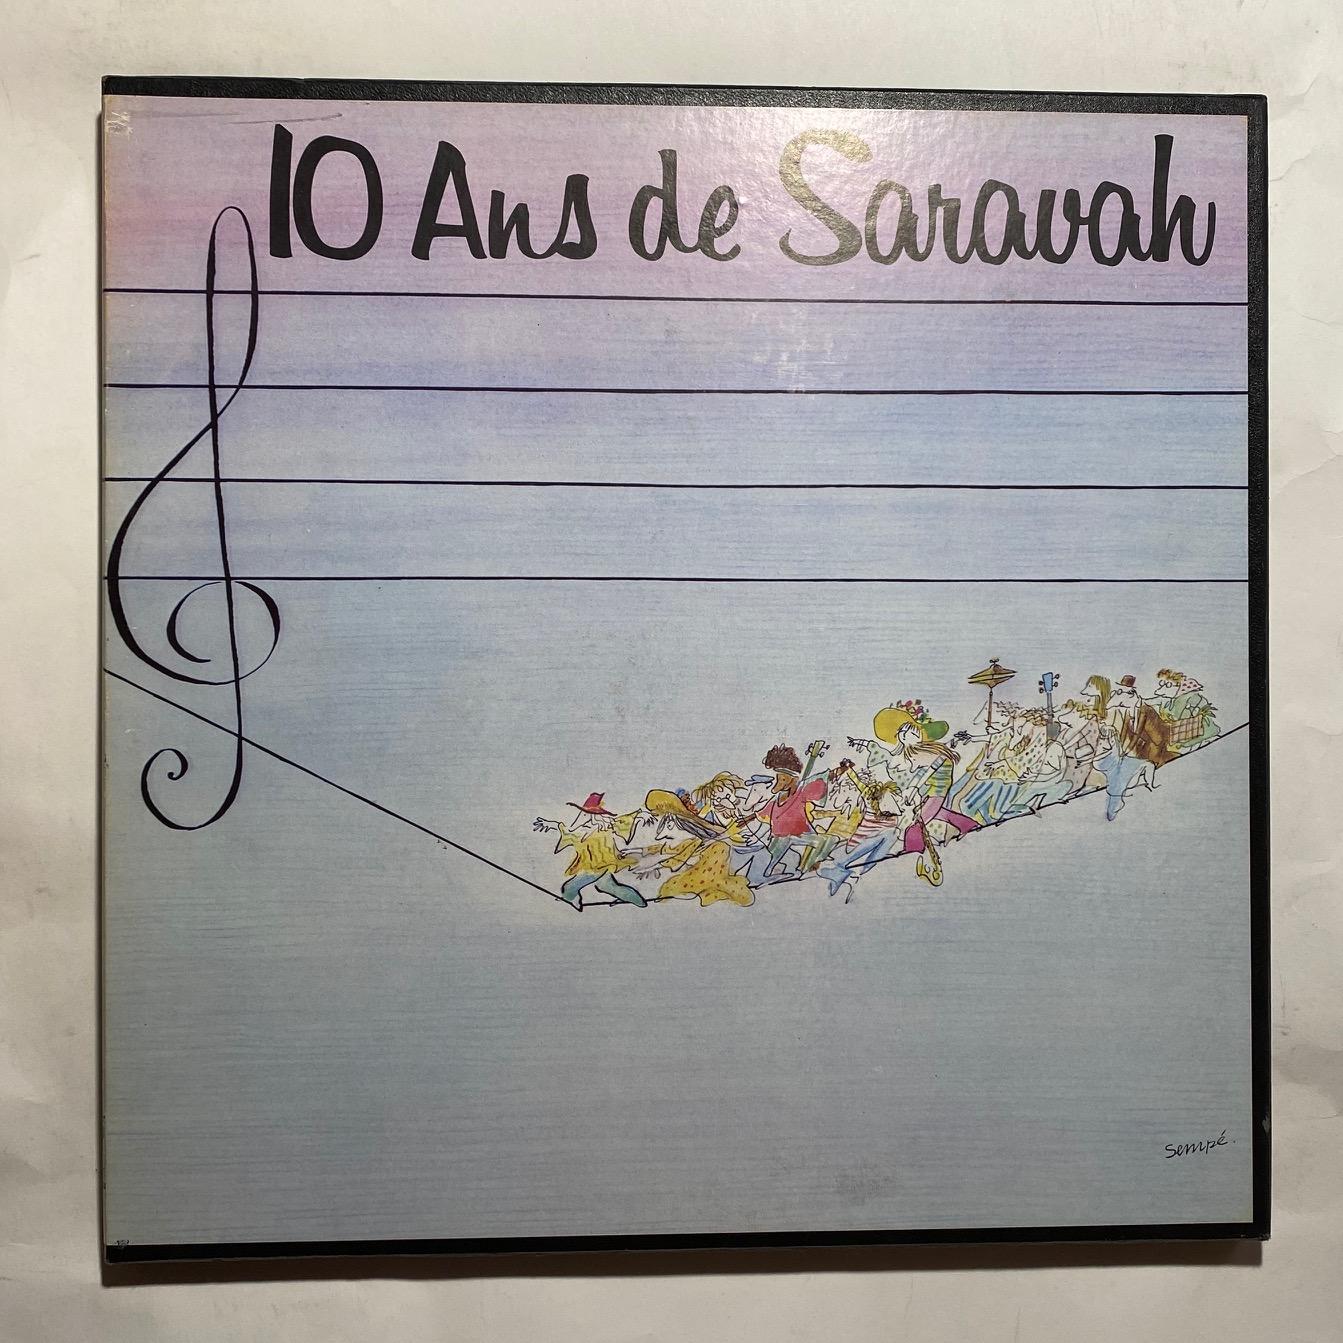 VARIOUS - 10 Ans De Saravah - LP Box Set